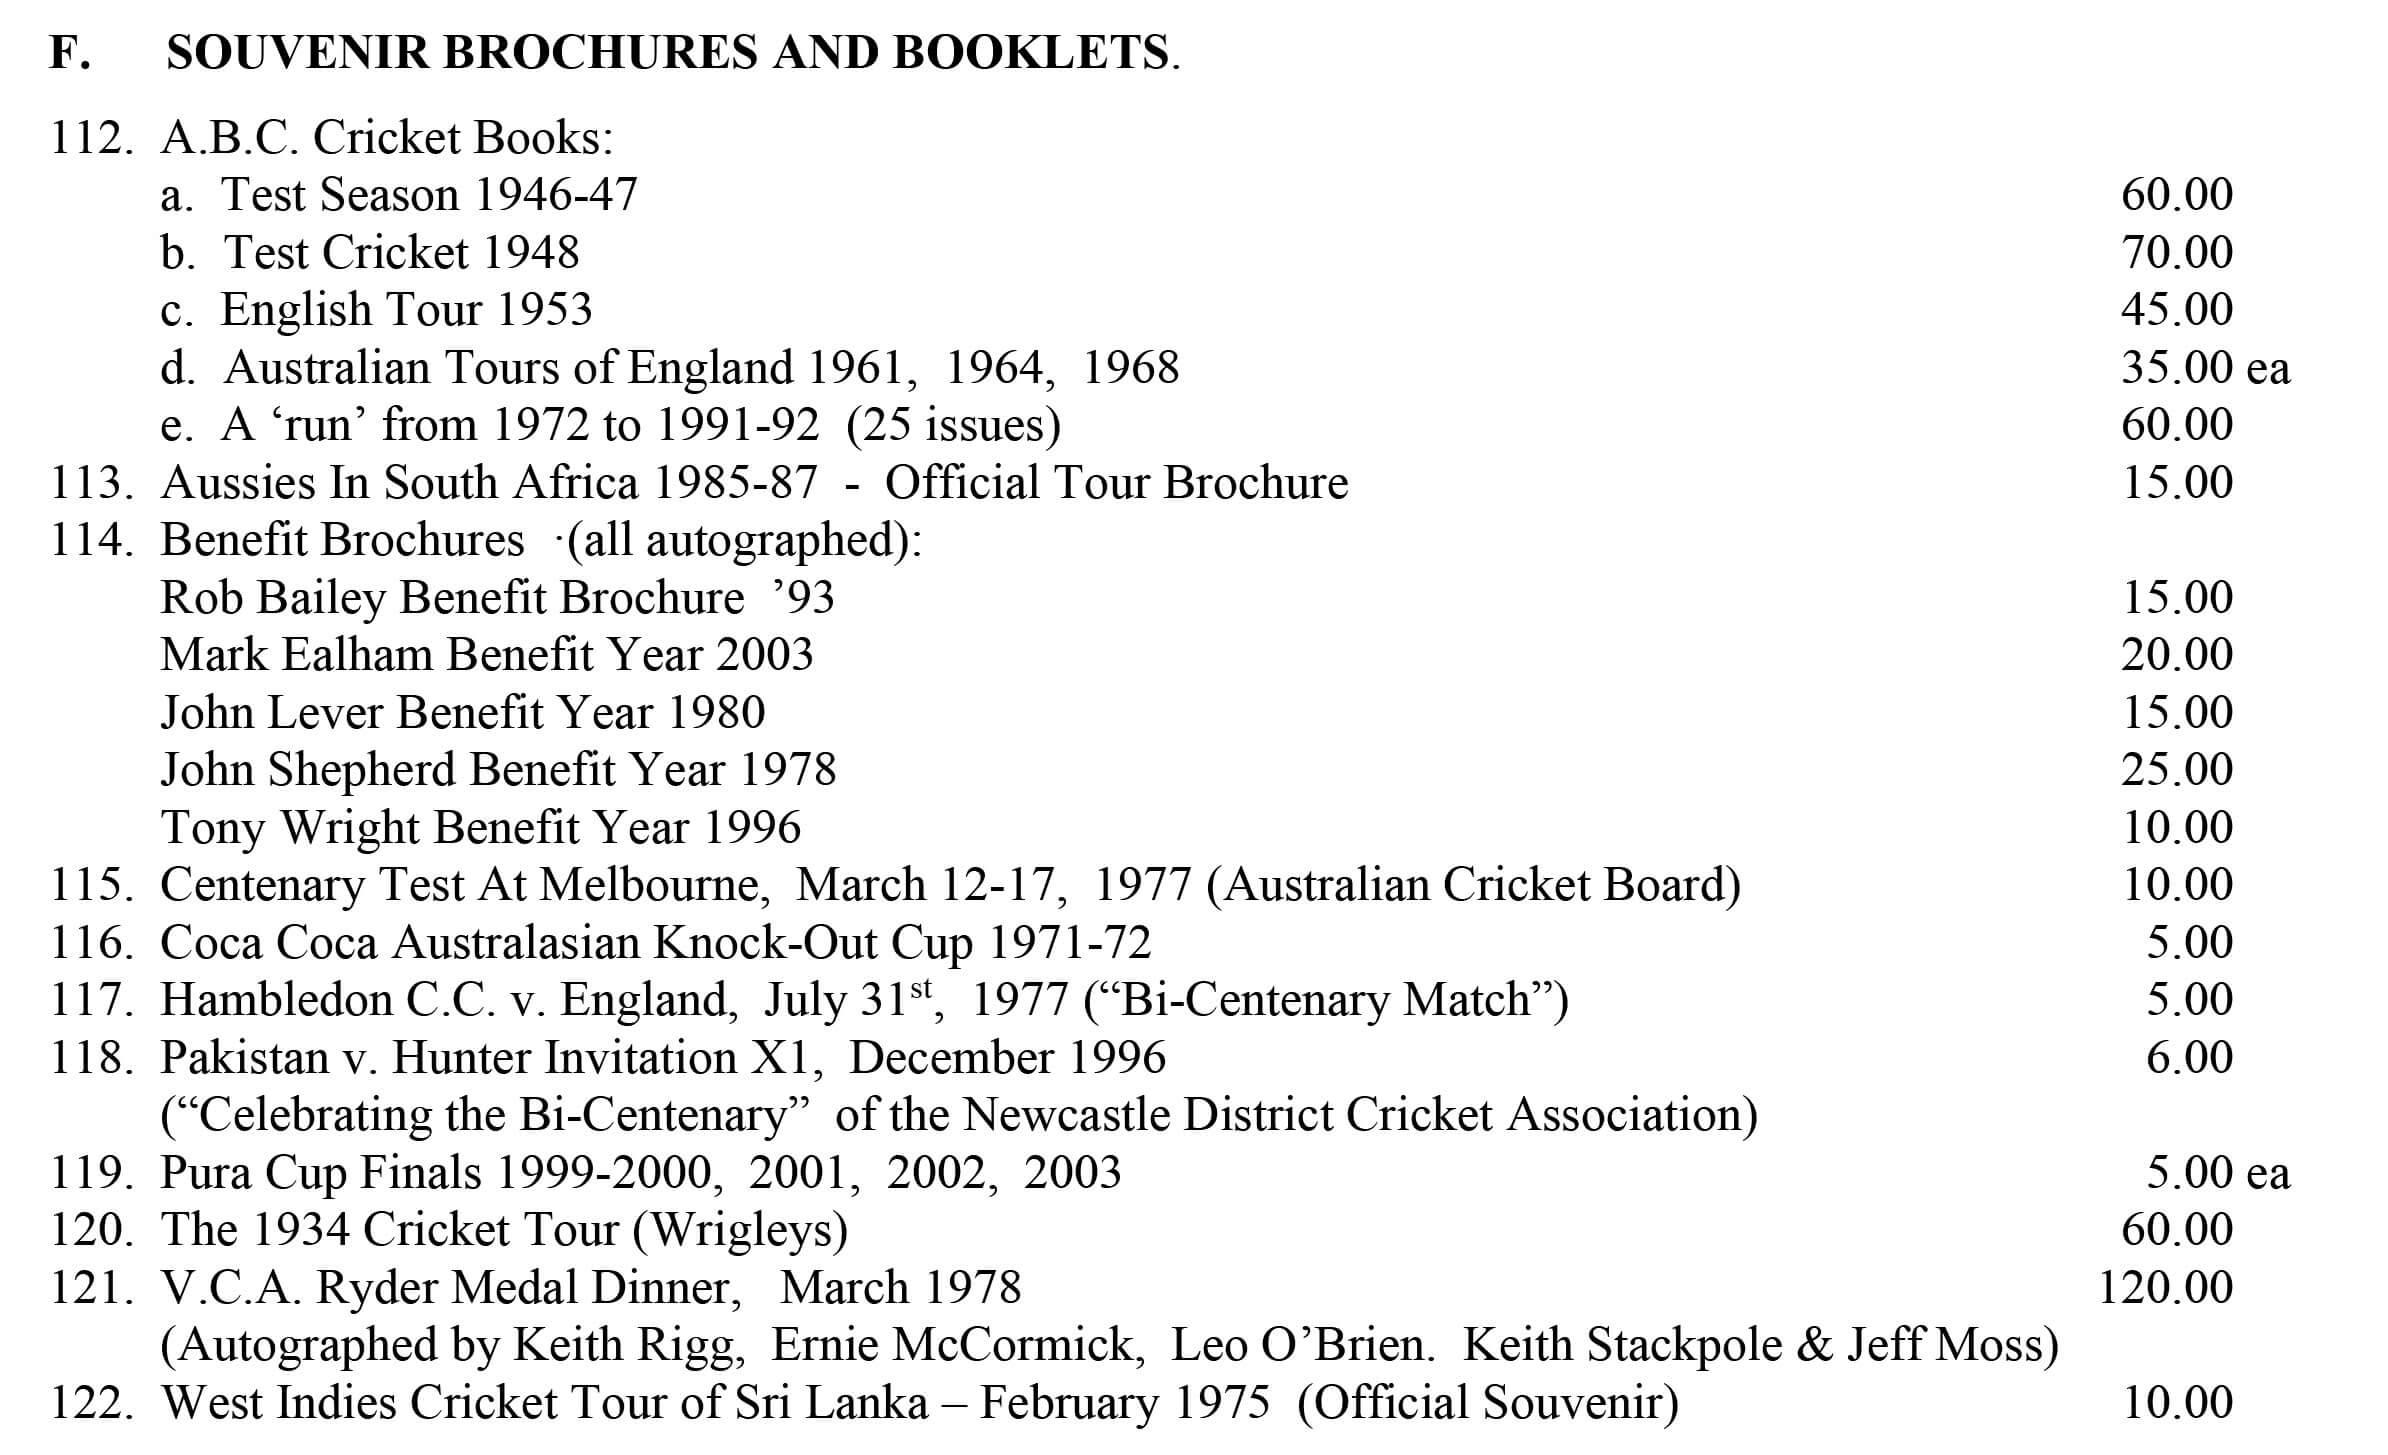 Roger Page Cricket Books Souvenir Cricket Brochures Booklets June 2020